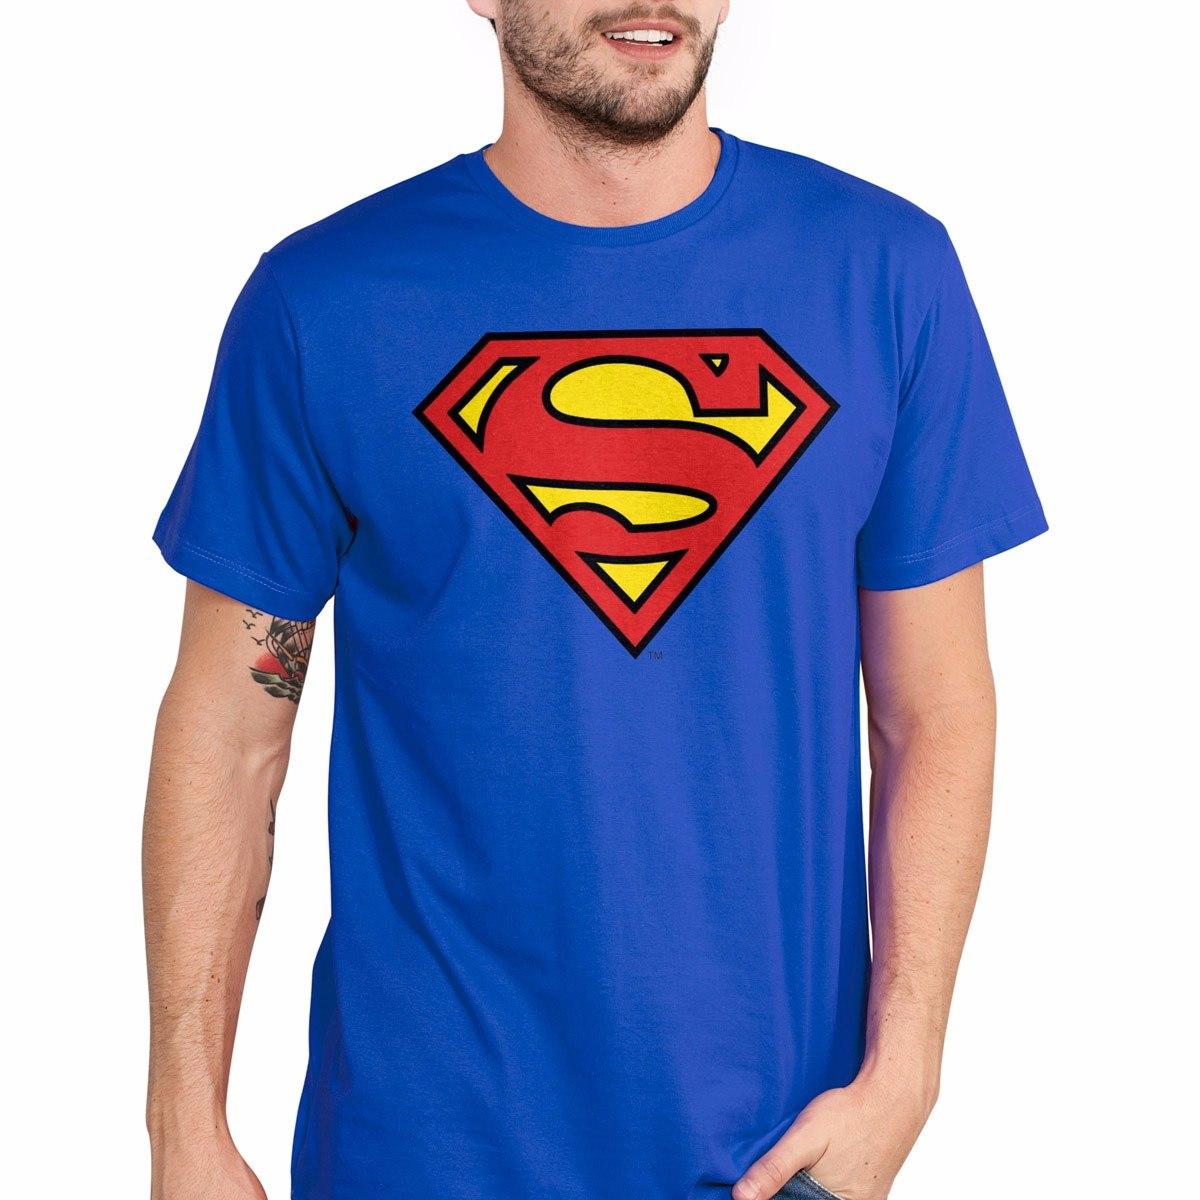 494ab2ec0 Kit De Camisetas Batman Flash Superman Logo Oficial - R  119